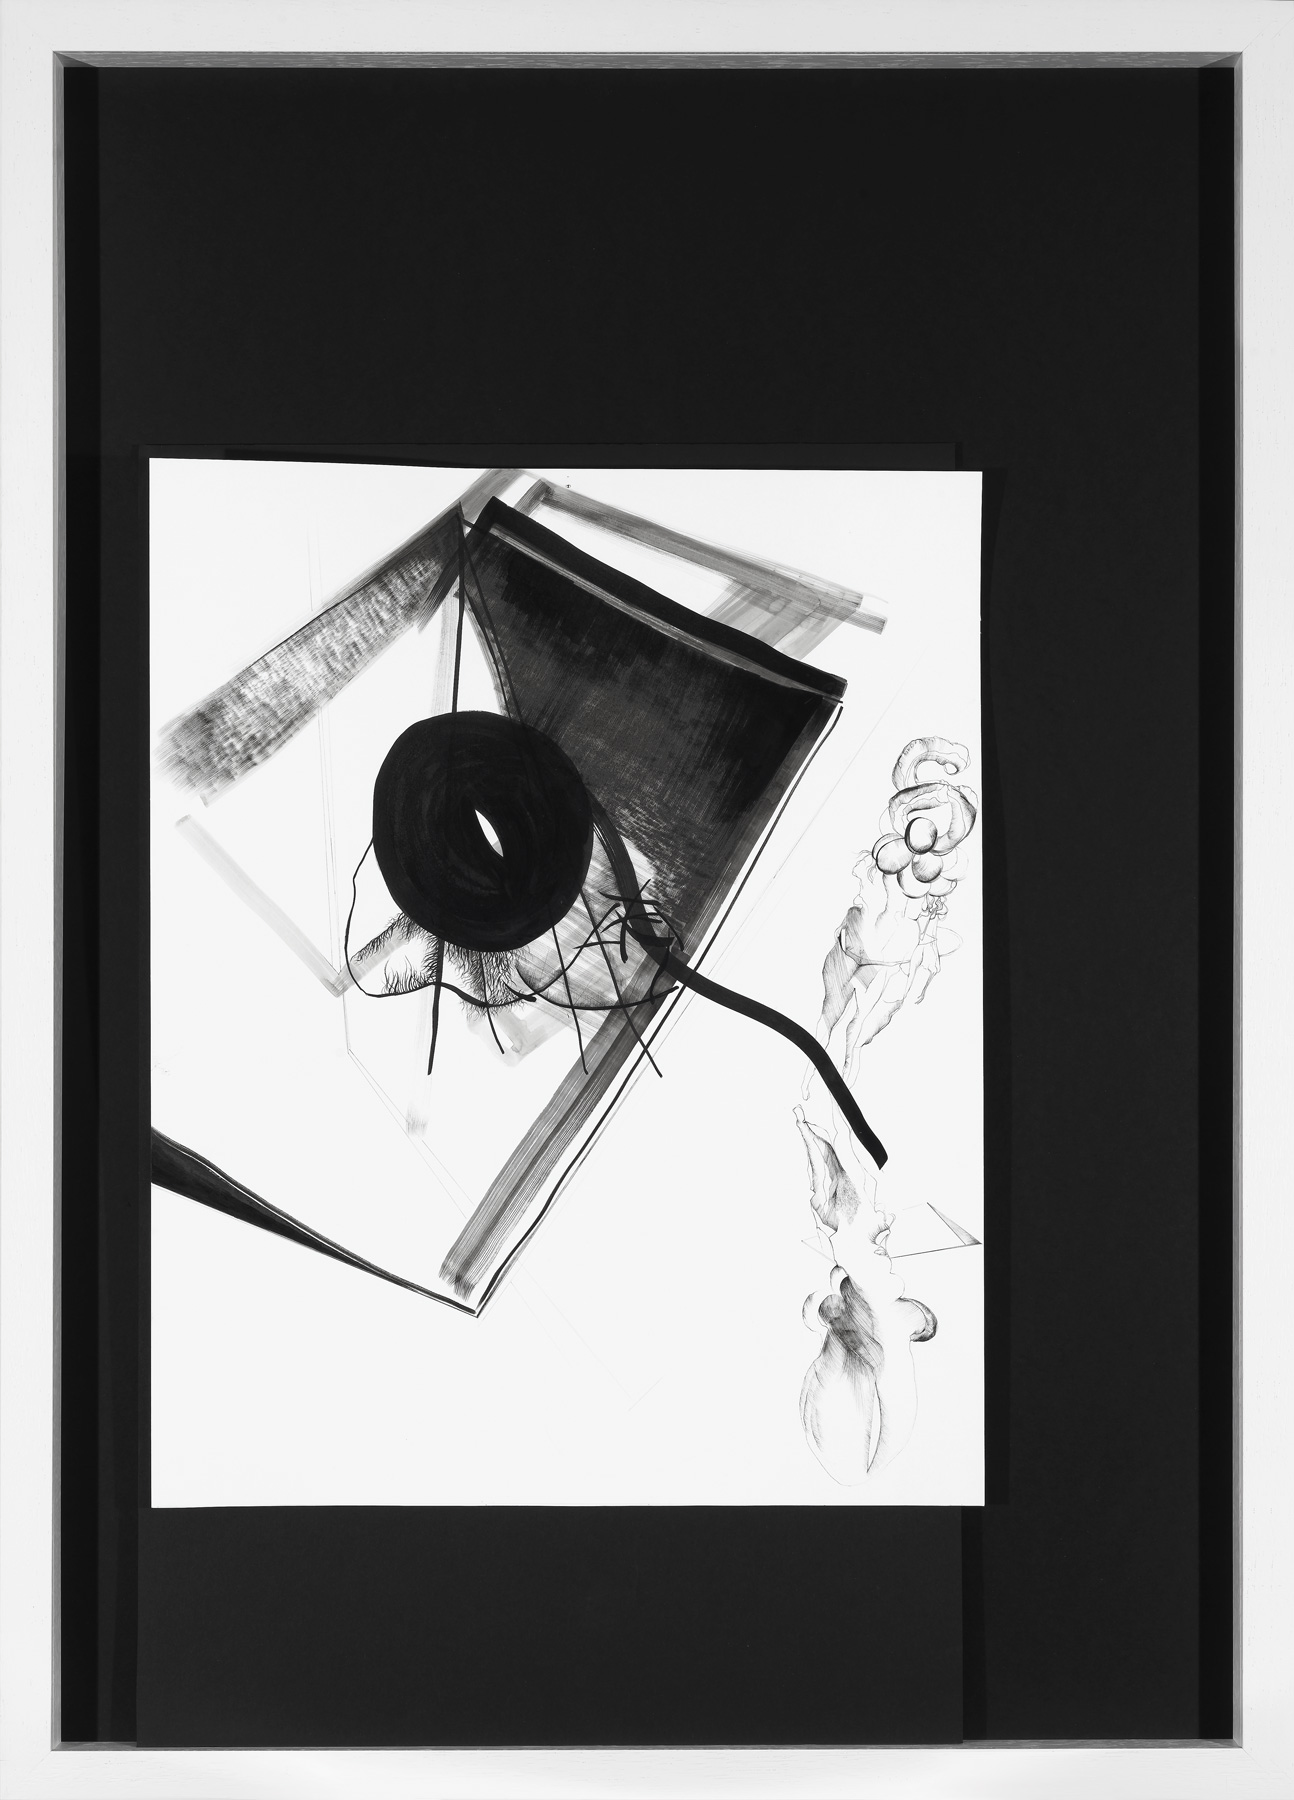 Nina Annabelle Märkl | Balancing the Whimsical 1 | Ink on paper, black cardboard, needle | 105 x 75 x 5 cm | 2015